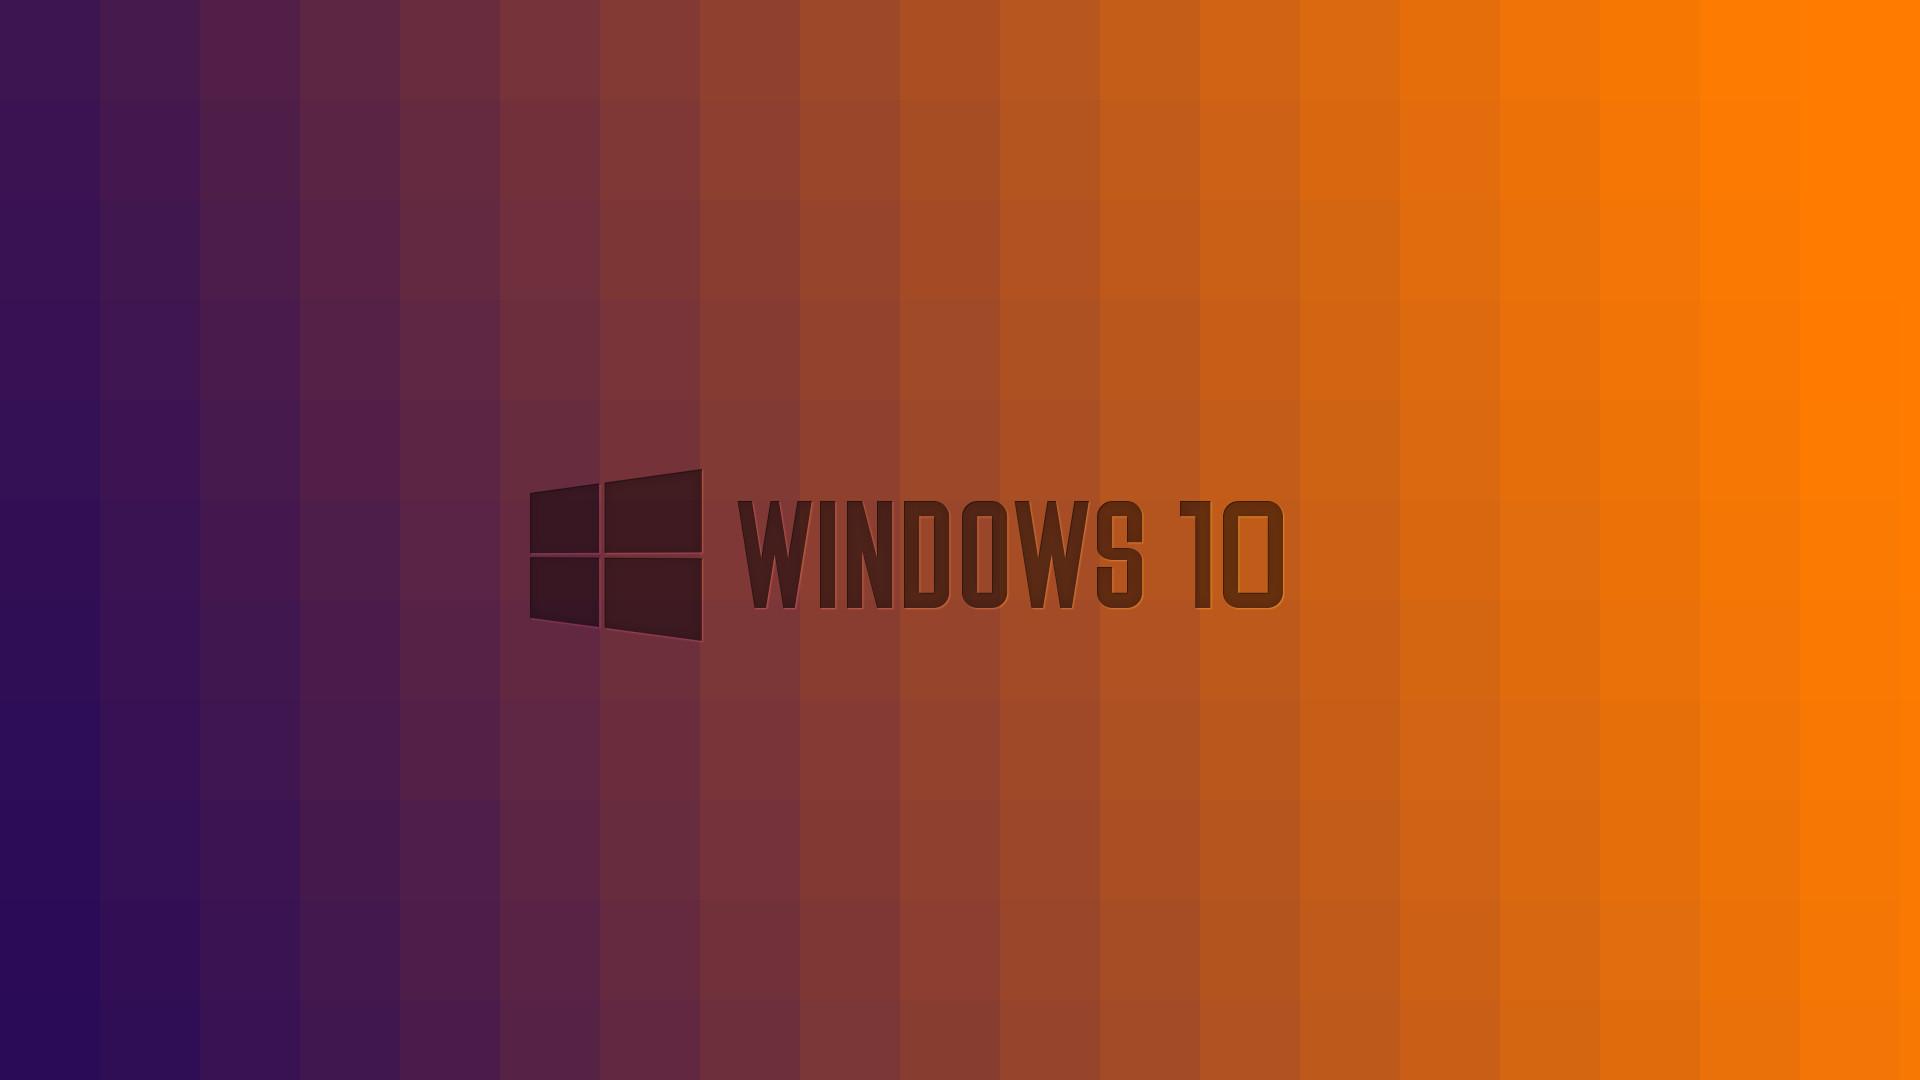 Windows 10 Wallpaper Pack: Red Windows 10 Wallpaper HD (71+ Images